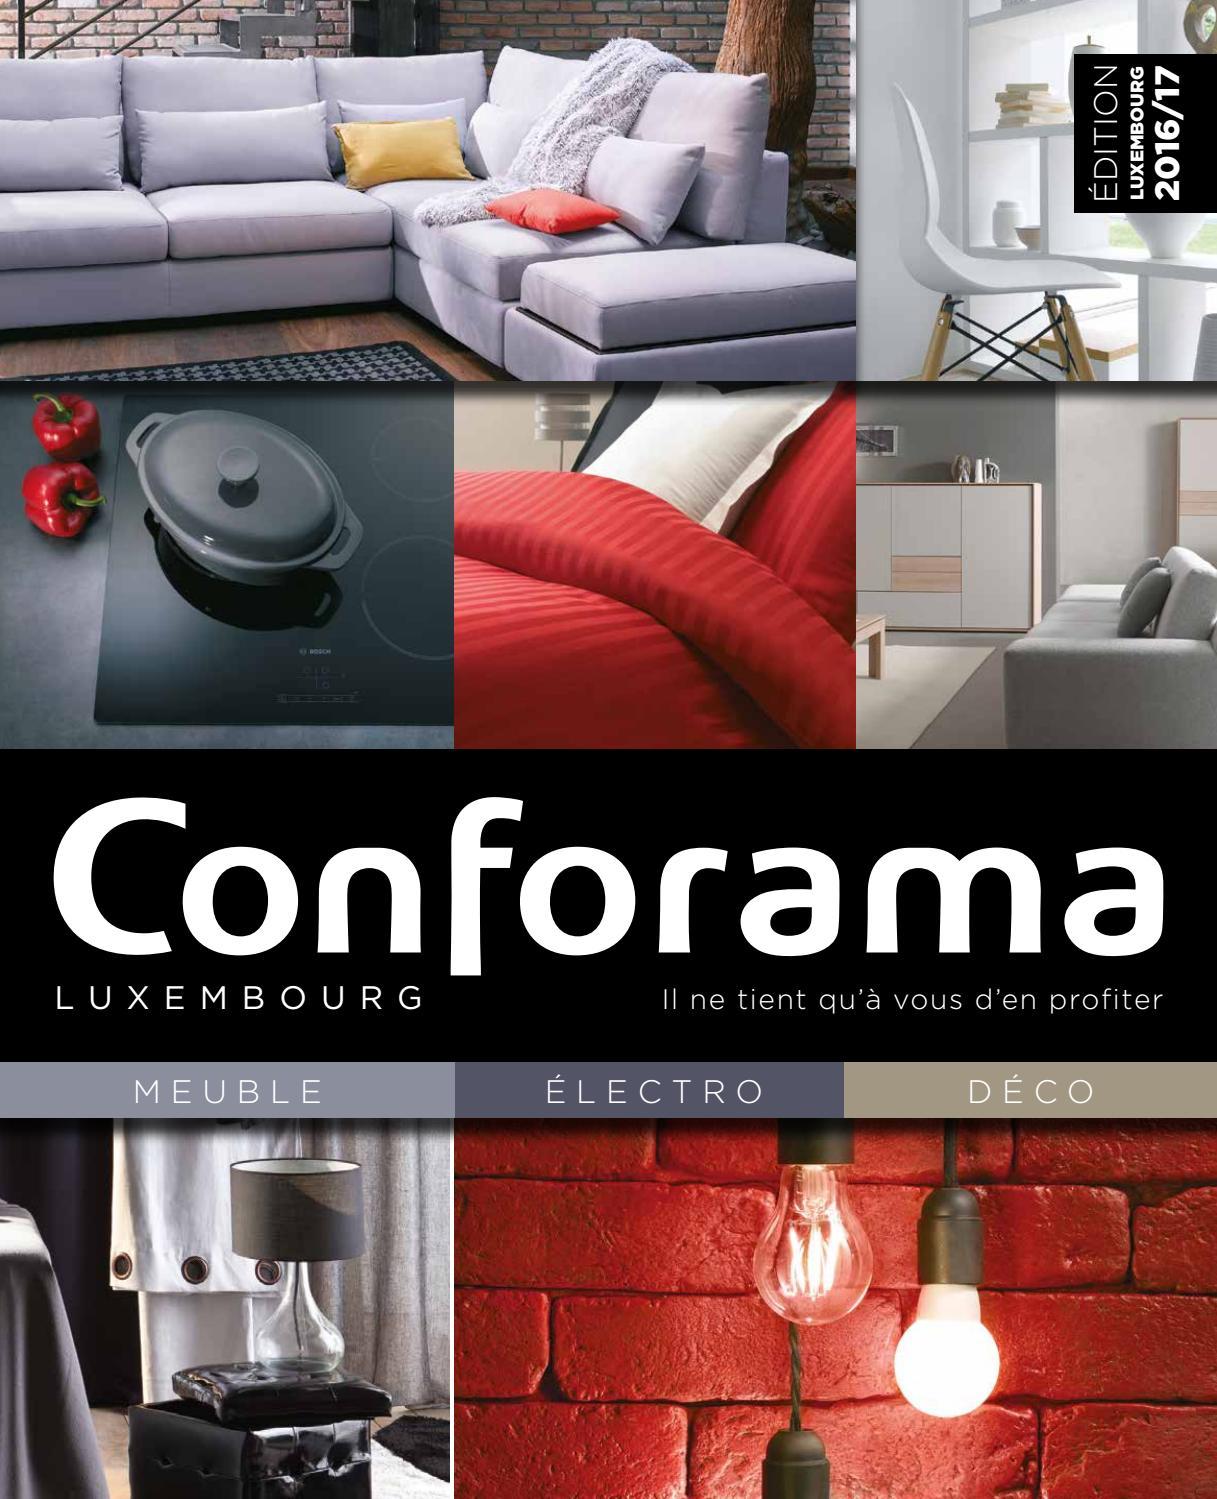 meuble four conforama meuble pour four et micro onde. Black Bedroom Furniture Sets. Home Design Ideas